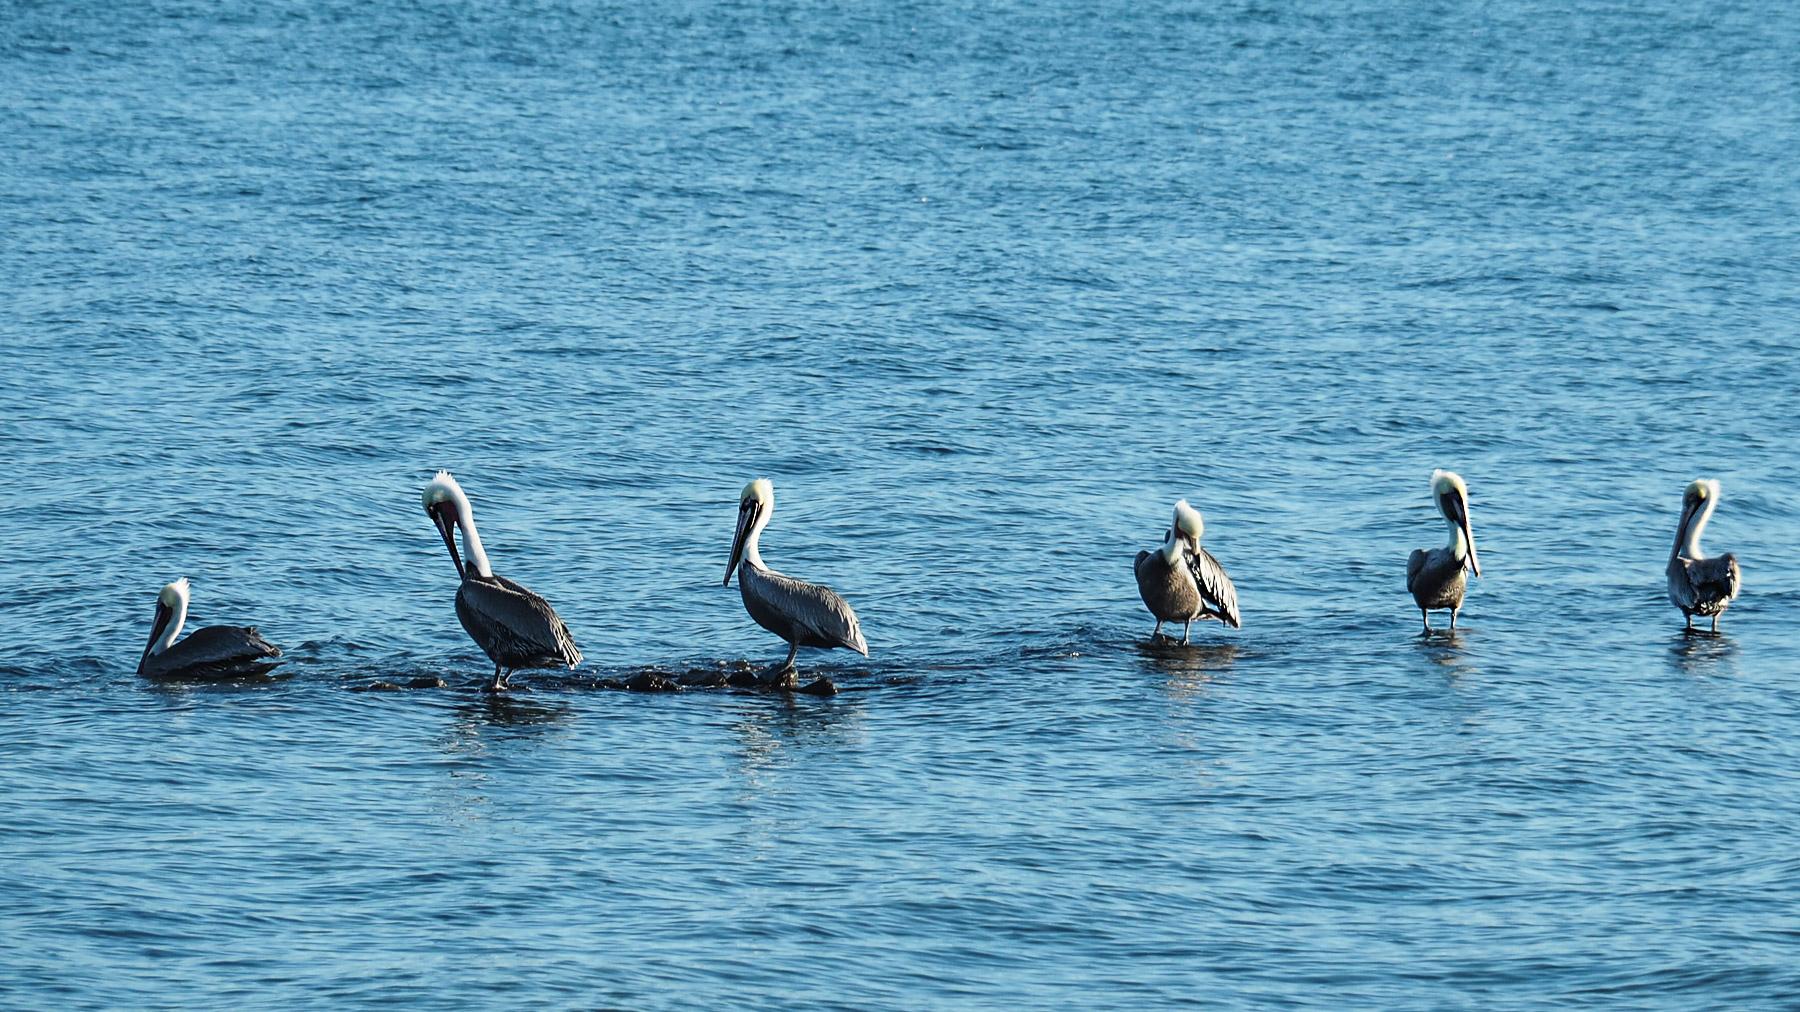 Pelikane gefallen uns am besten